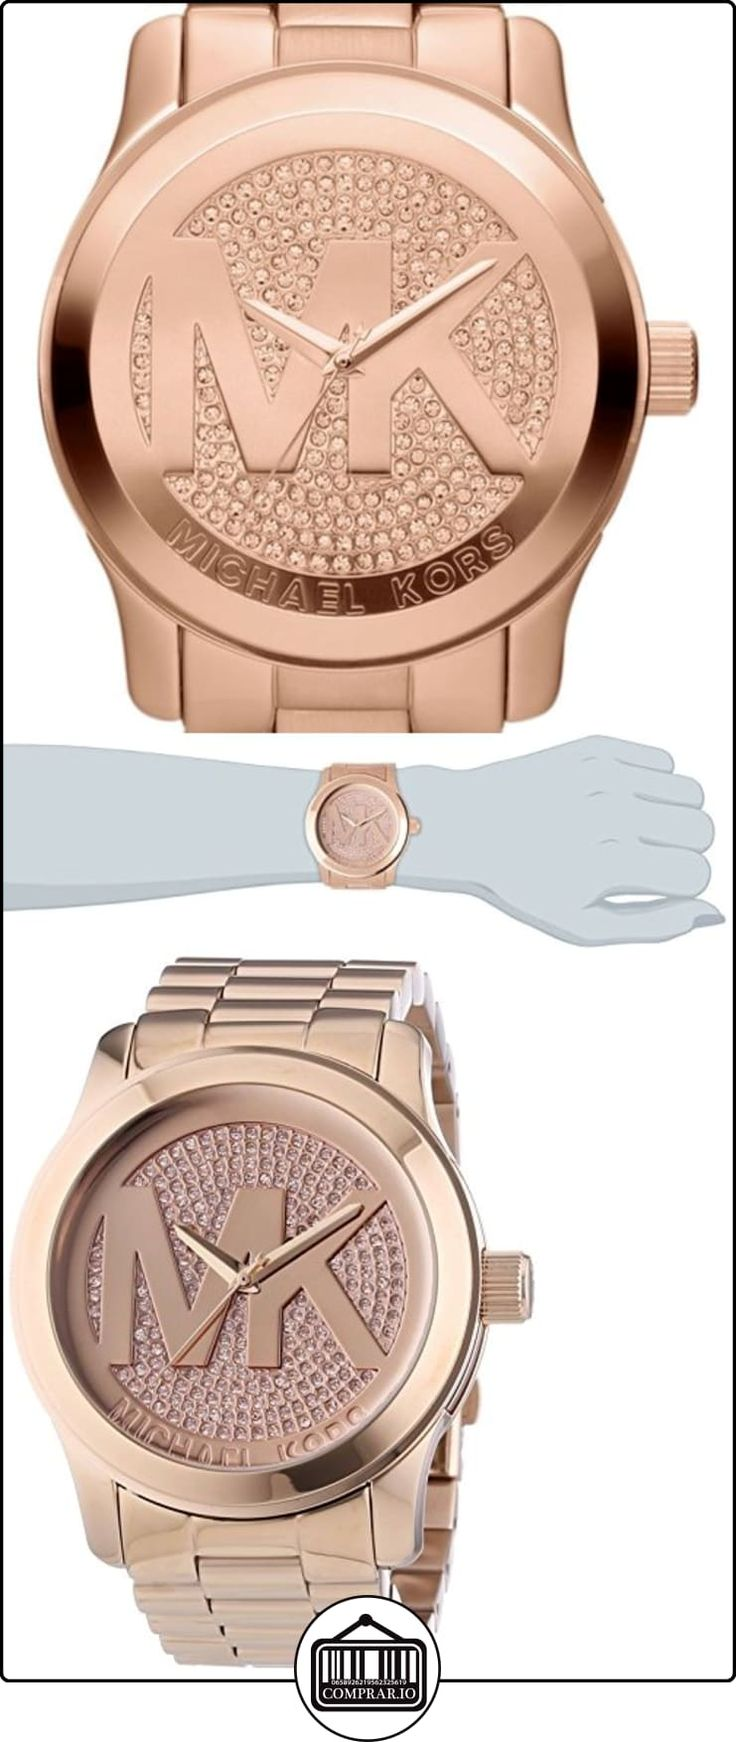 Michael Kors MK5661 - Reloj de pulsera mujer, acero inoxidable ✿ Relojes para mujer - (Gama media/alta) ✿